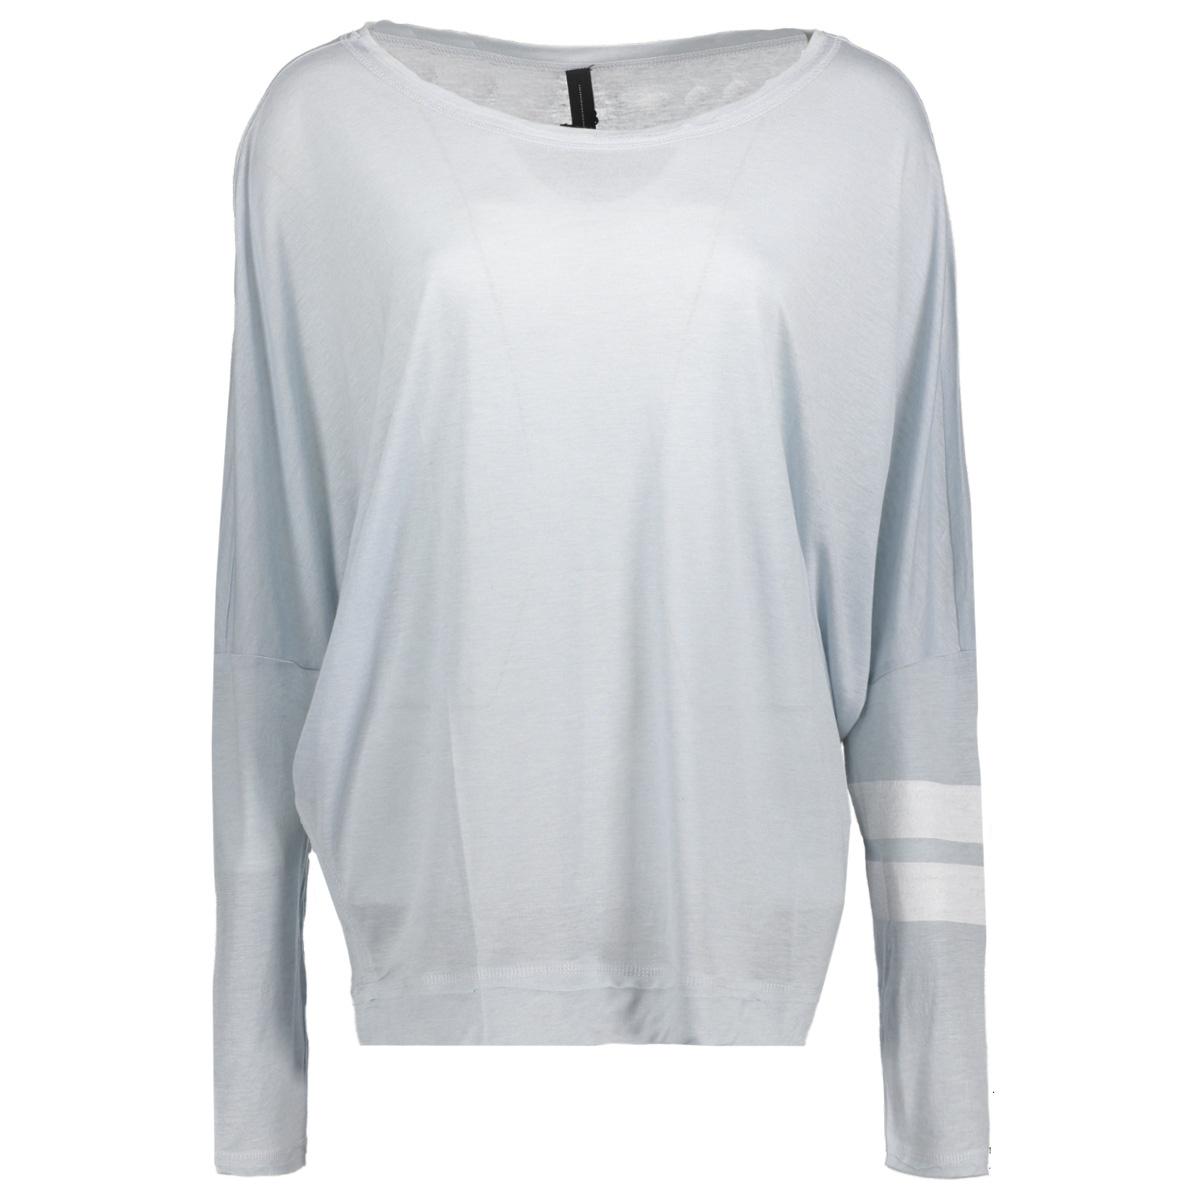 20-780-8101 10 days t-shirt sky blue